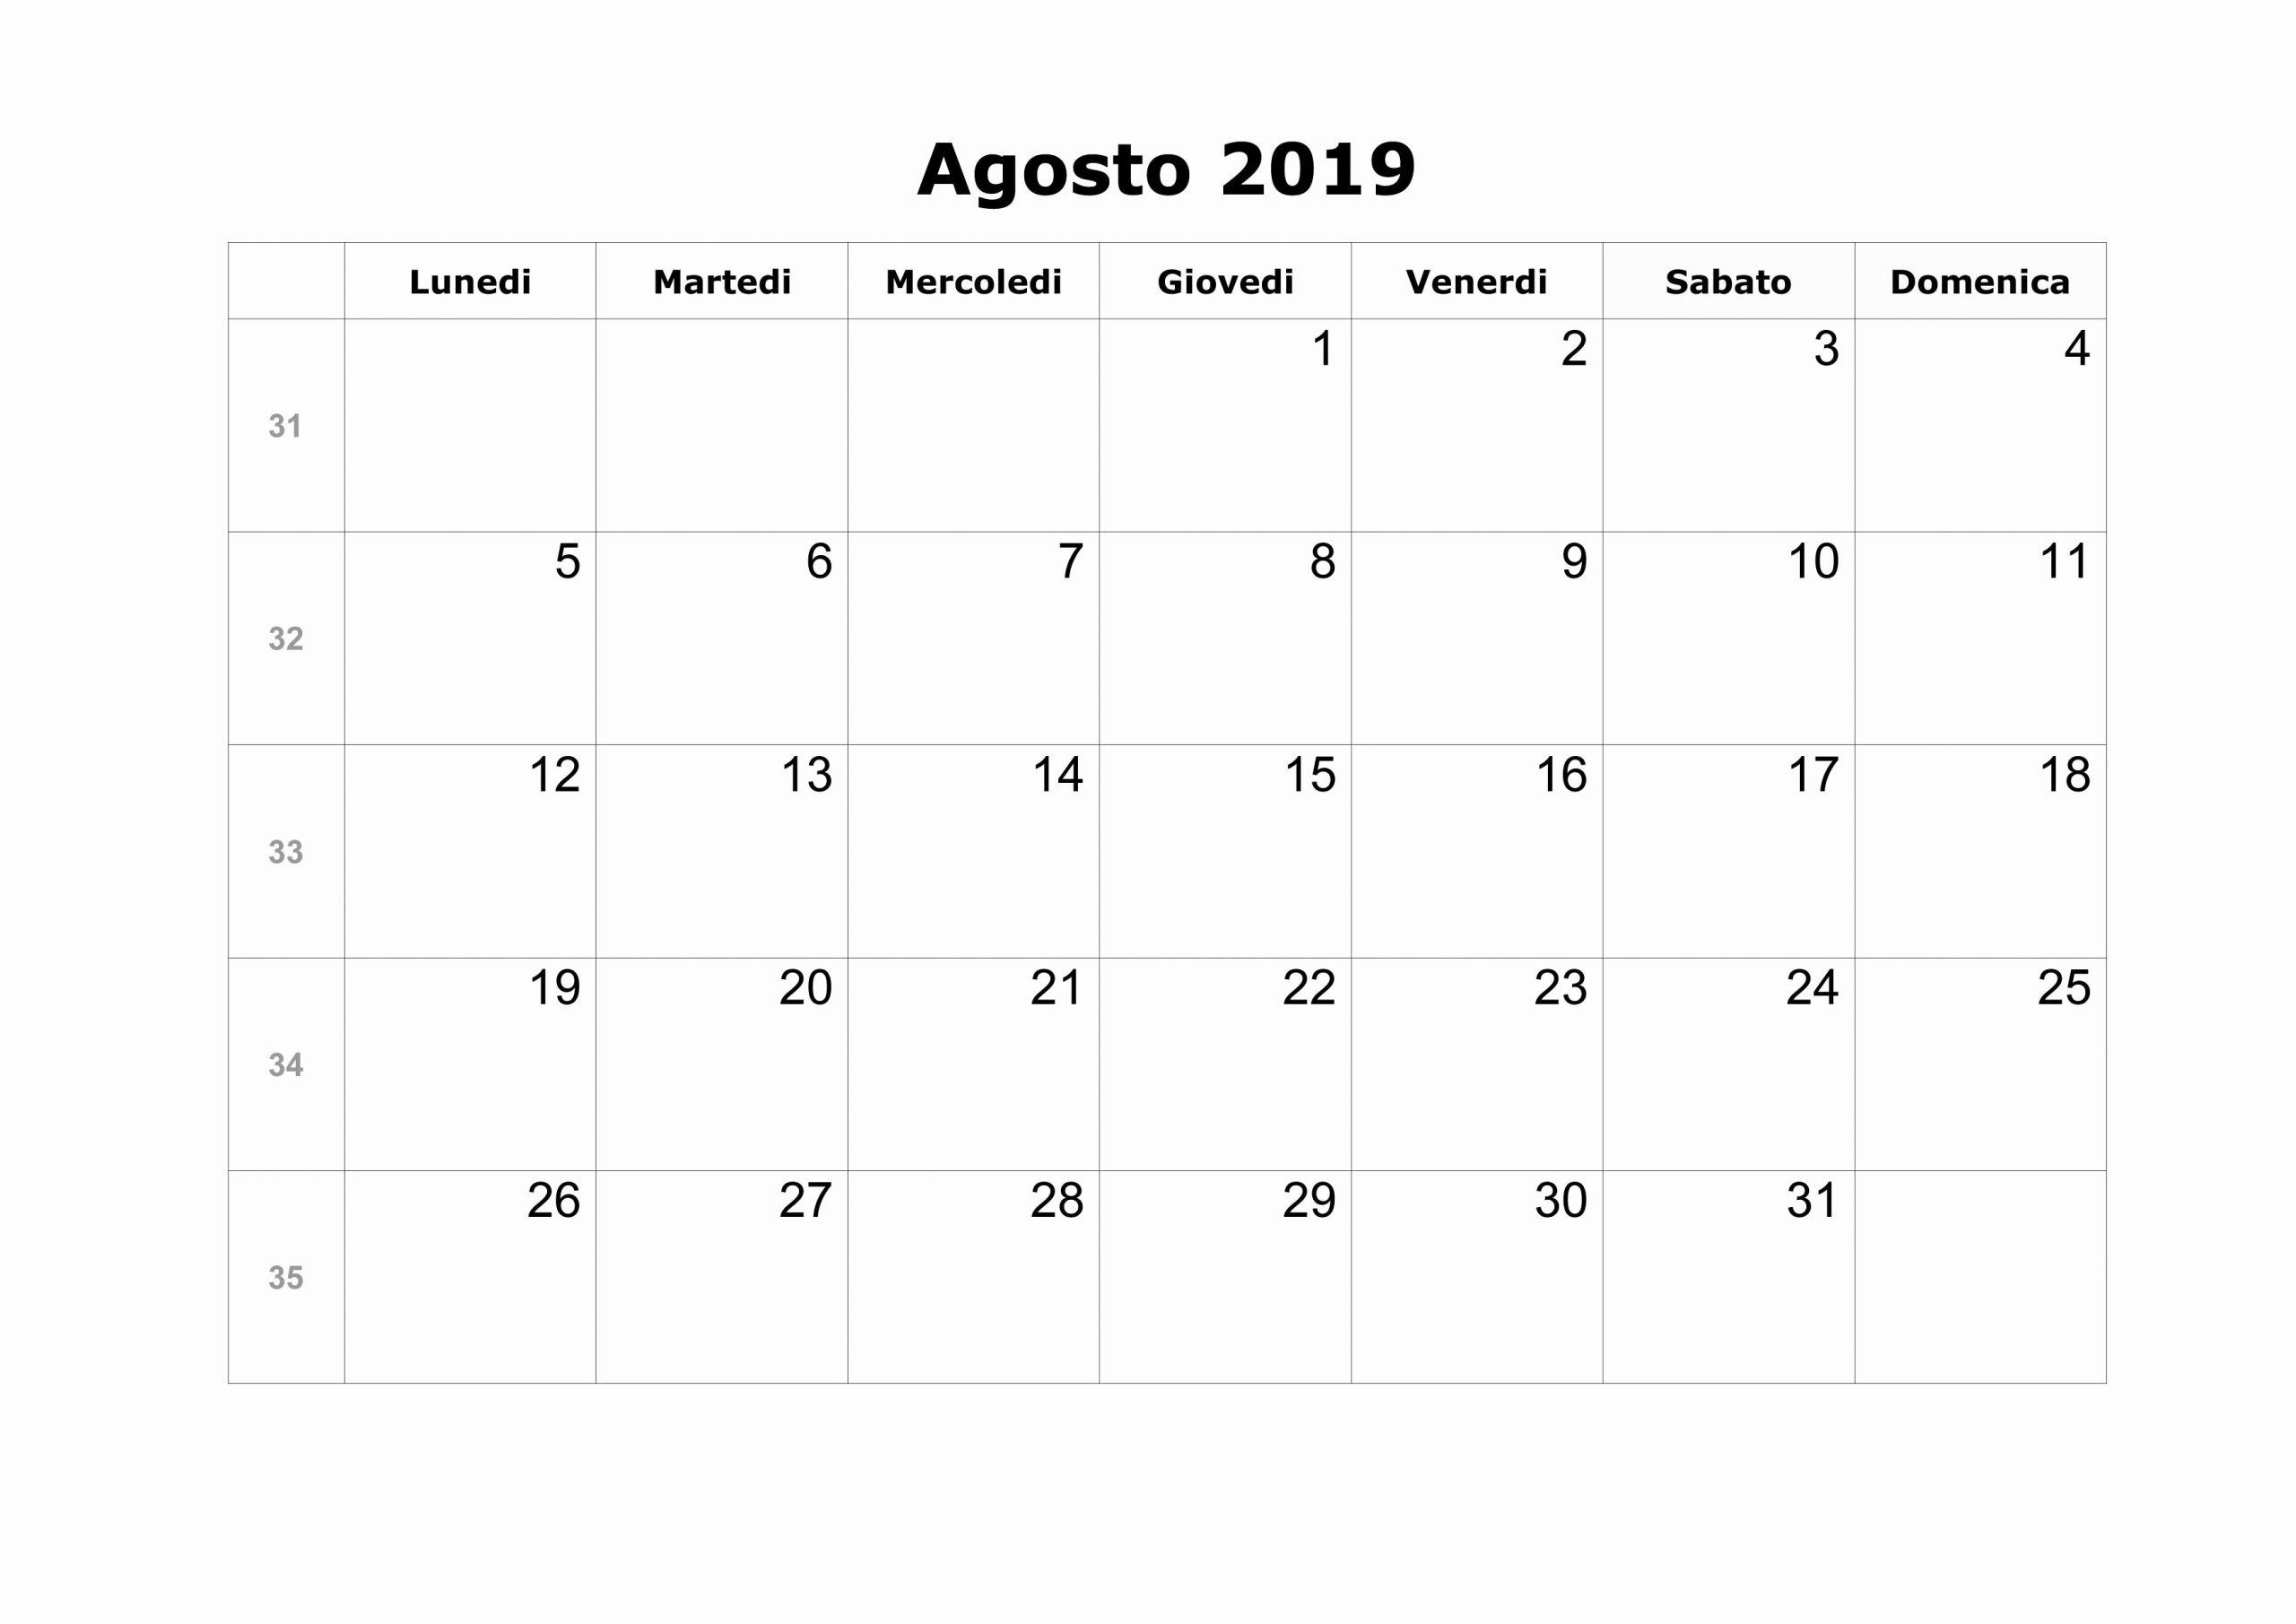 Calendario 2020 Bolivia Con Feriados Recientes Informaci³n Calendario 2019 Para Imprimir Con Foto Gratis Of Calendario 2020 Bolivia Con Feriados Más Recientes Sharp Deutschland